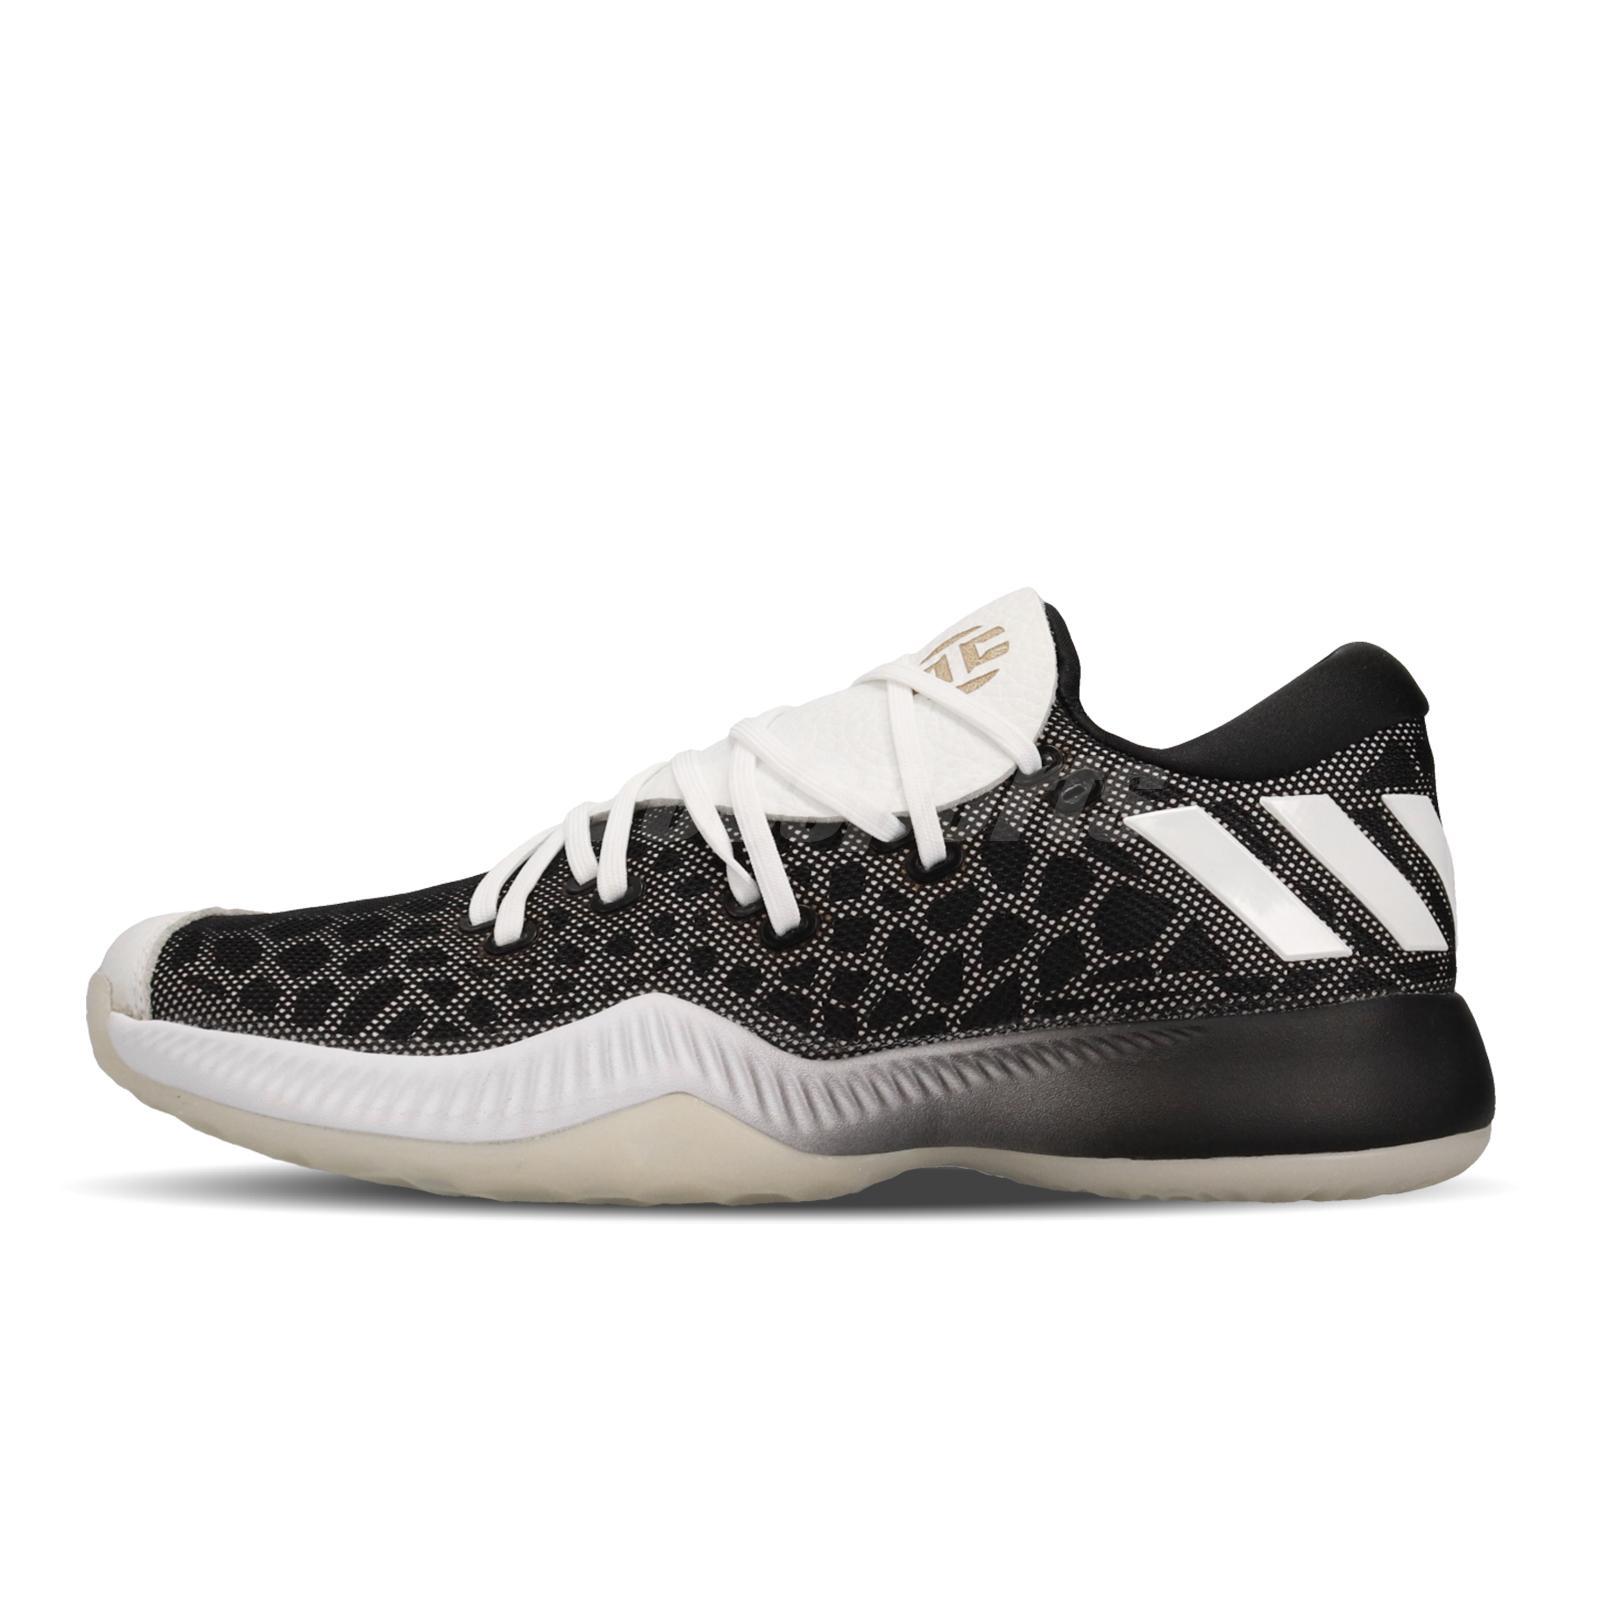 7b58375f16fe adidas Harden B E Bounce Black White James 13 Men Basketball Shoe Sneaker  CG4196